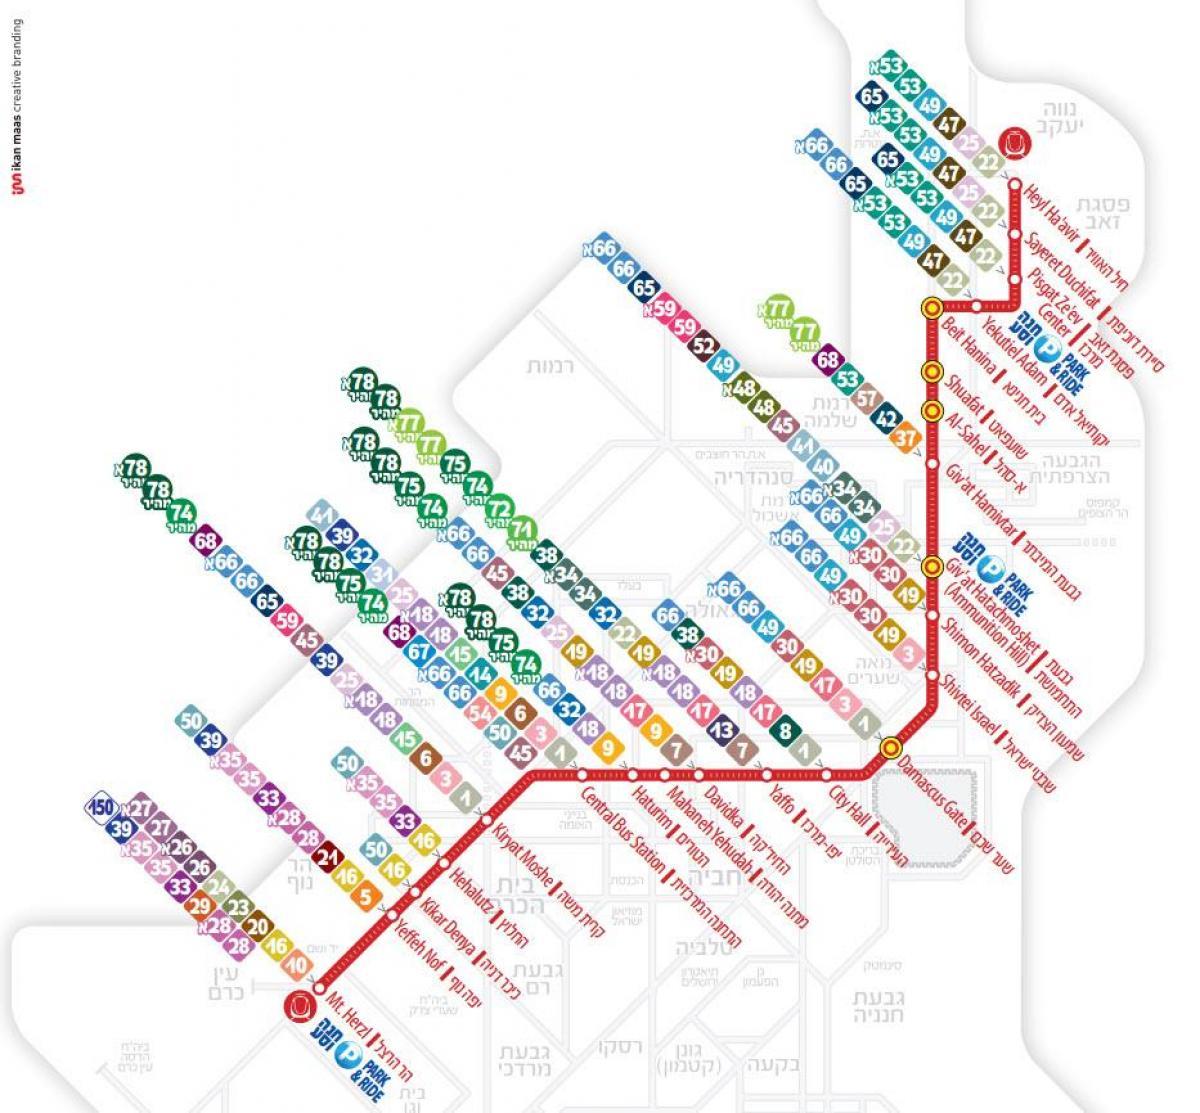 Jerusalem light rail map - Light rail Jerusalem map (Israel)